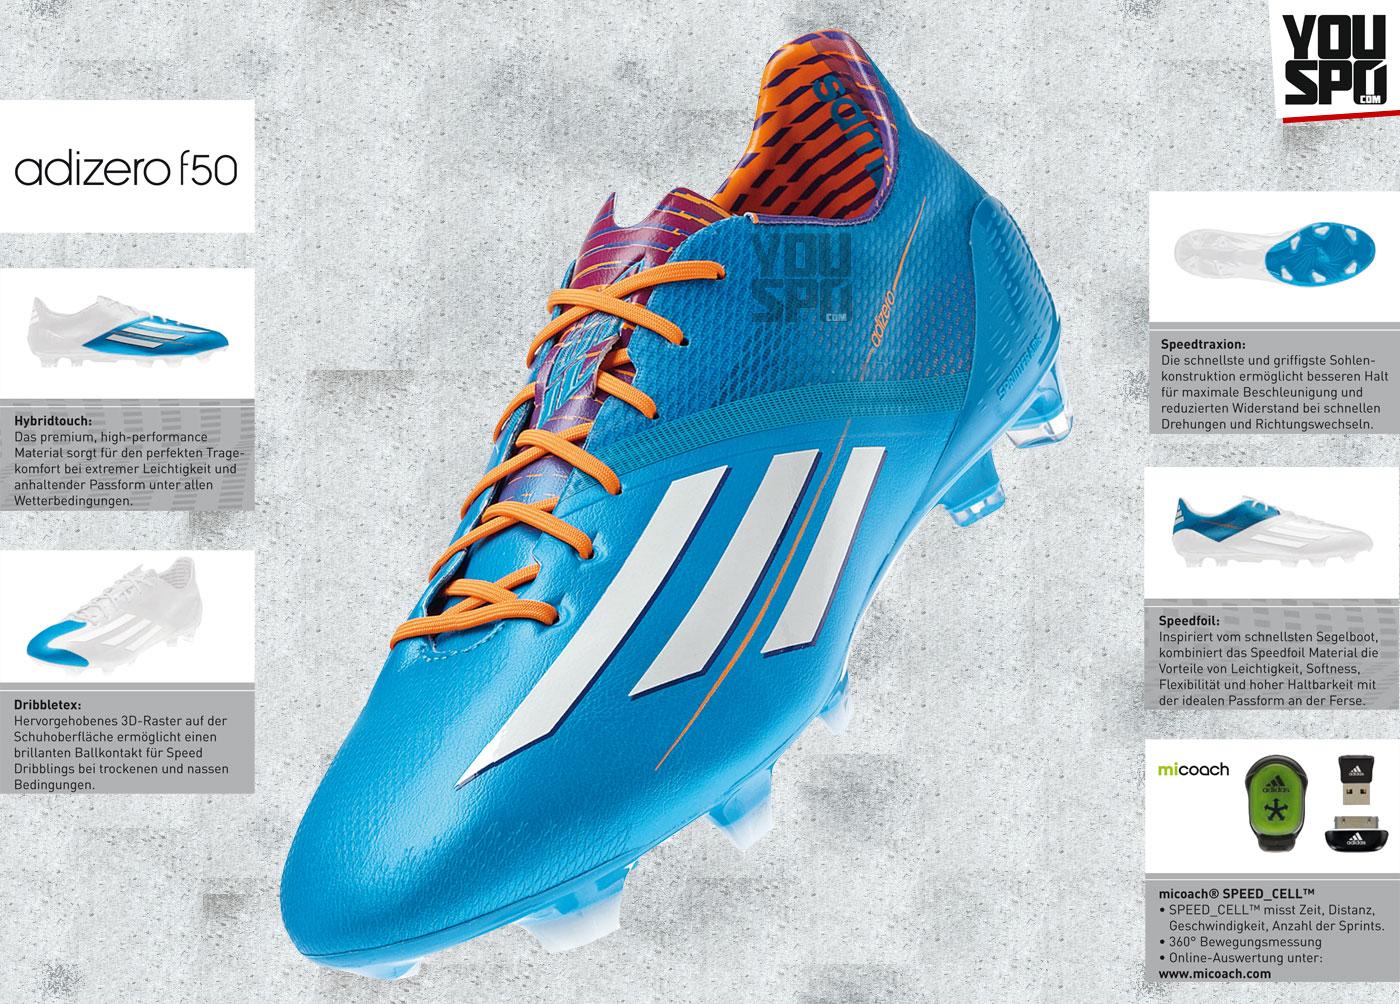 Adidas F50 adizero IV Fußballschuhe